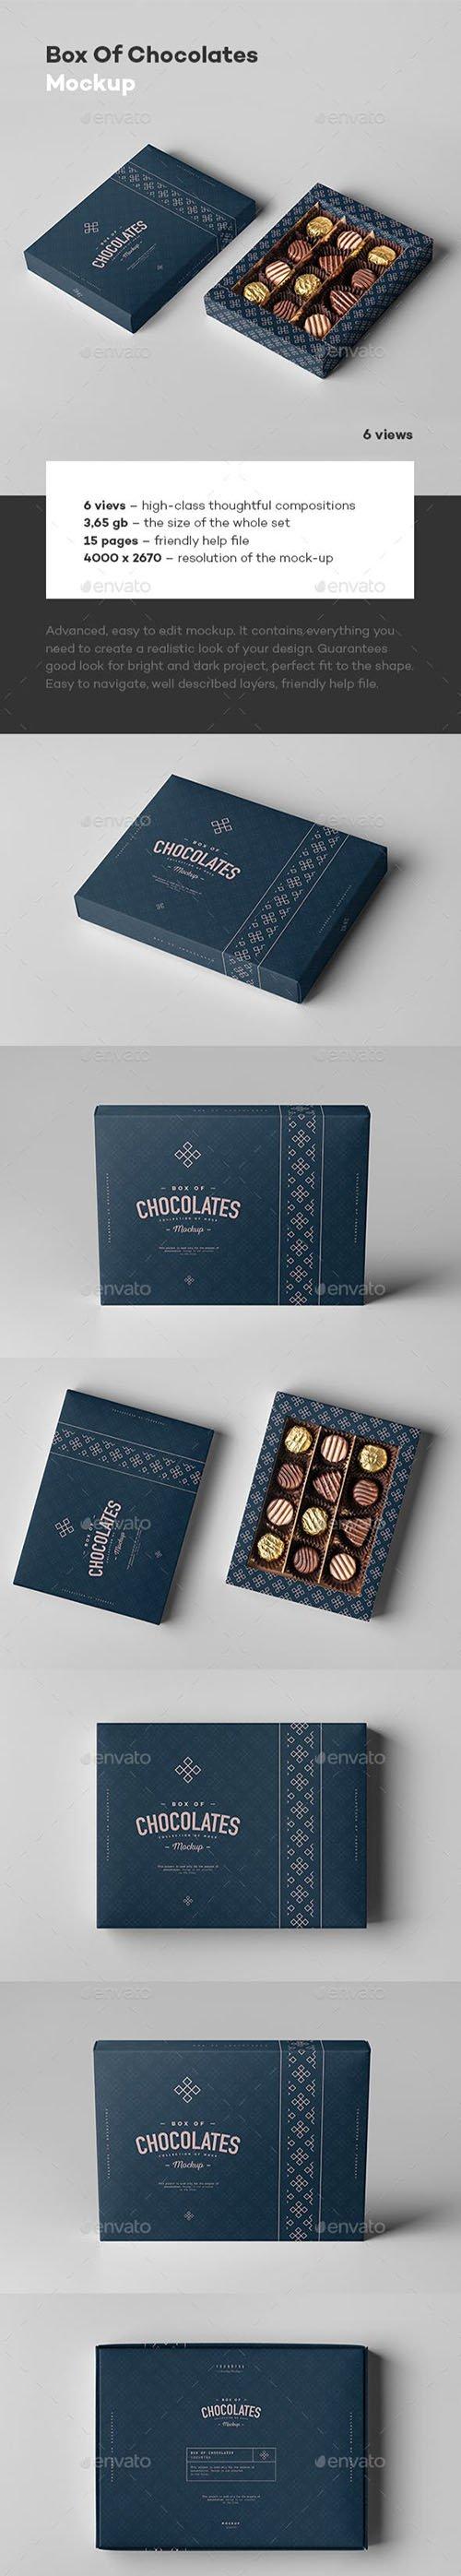 GR - Box Of Chocolates Mock-up 23126932